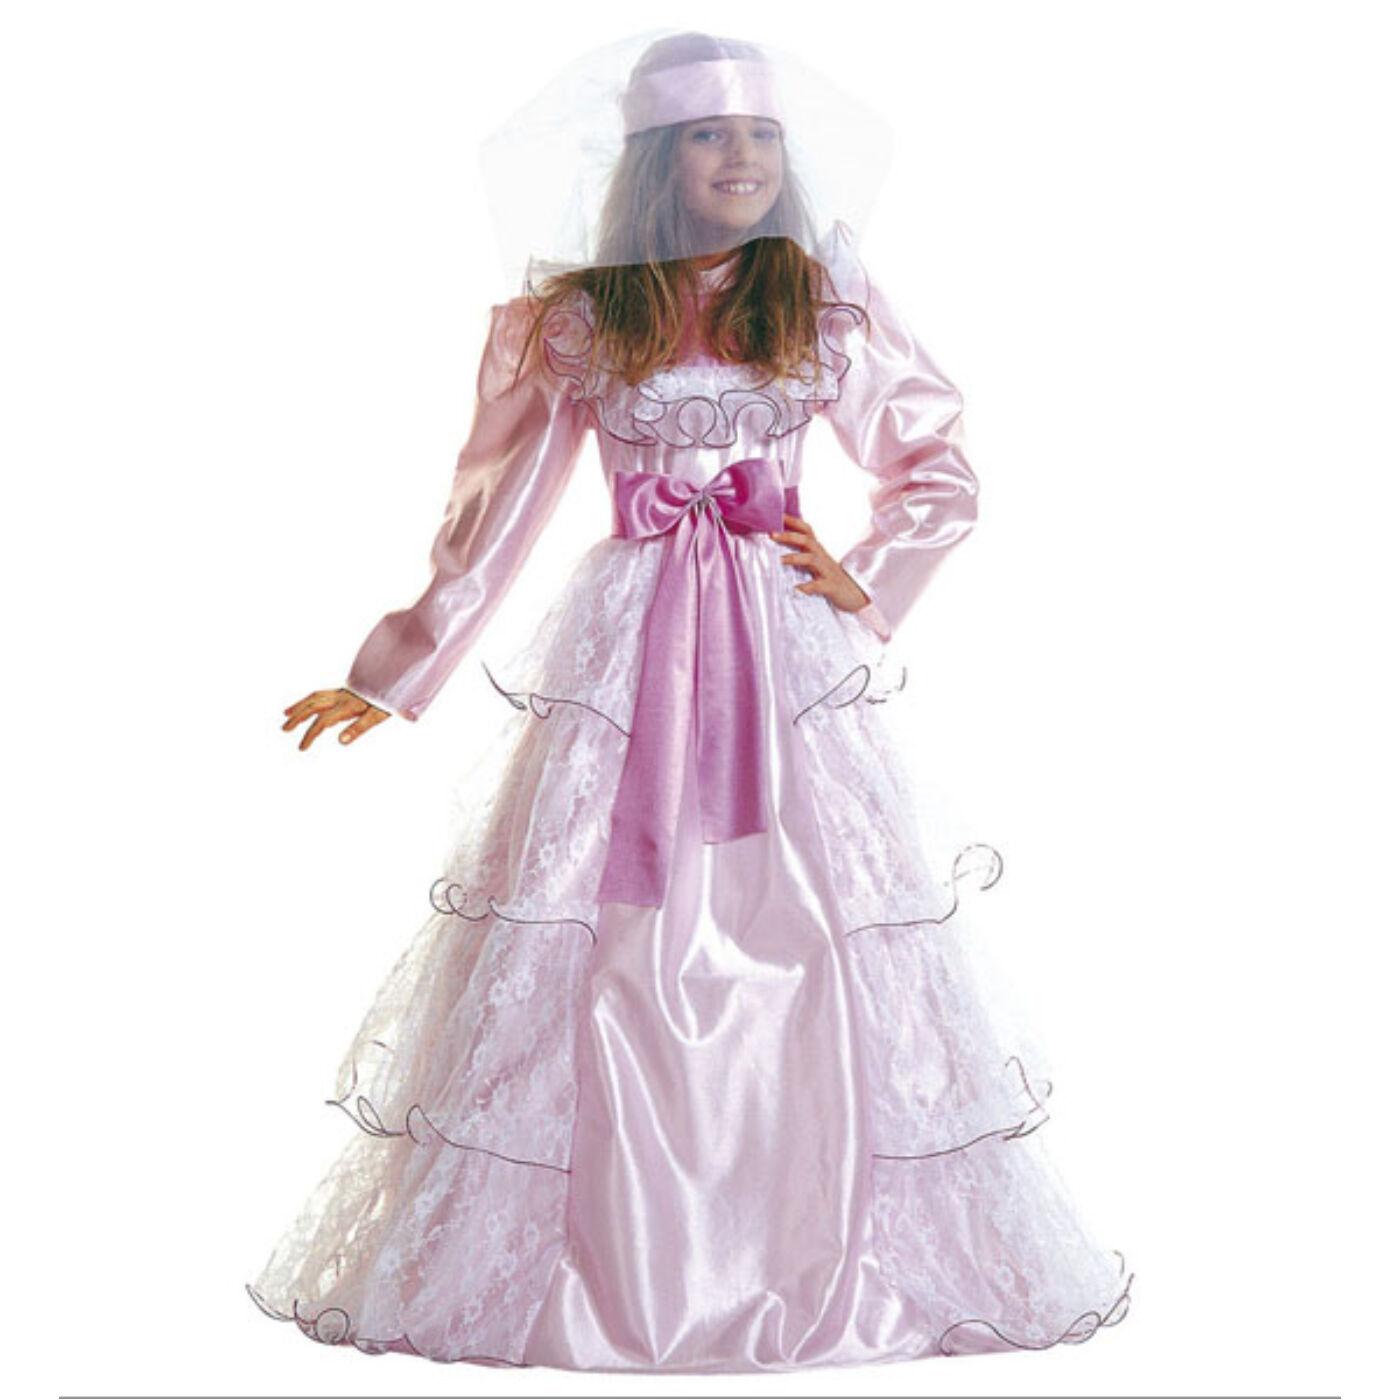 Gran Gala Lady Jelmez 140-es